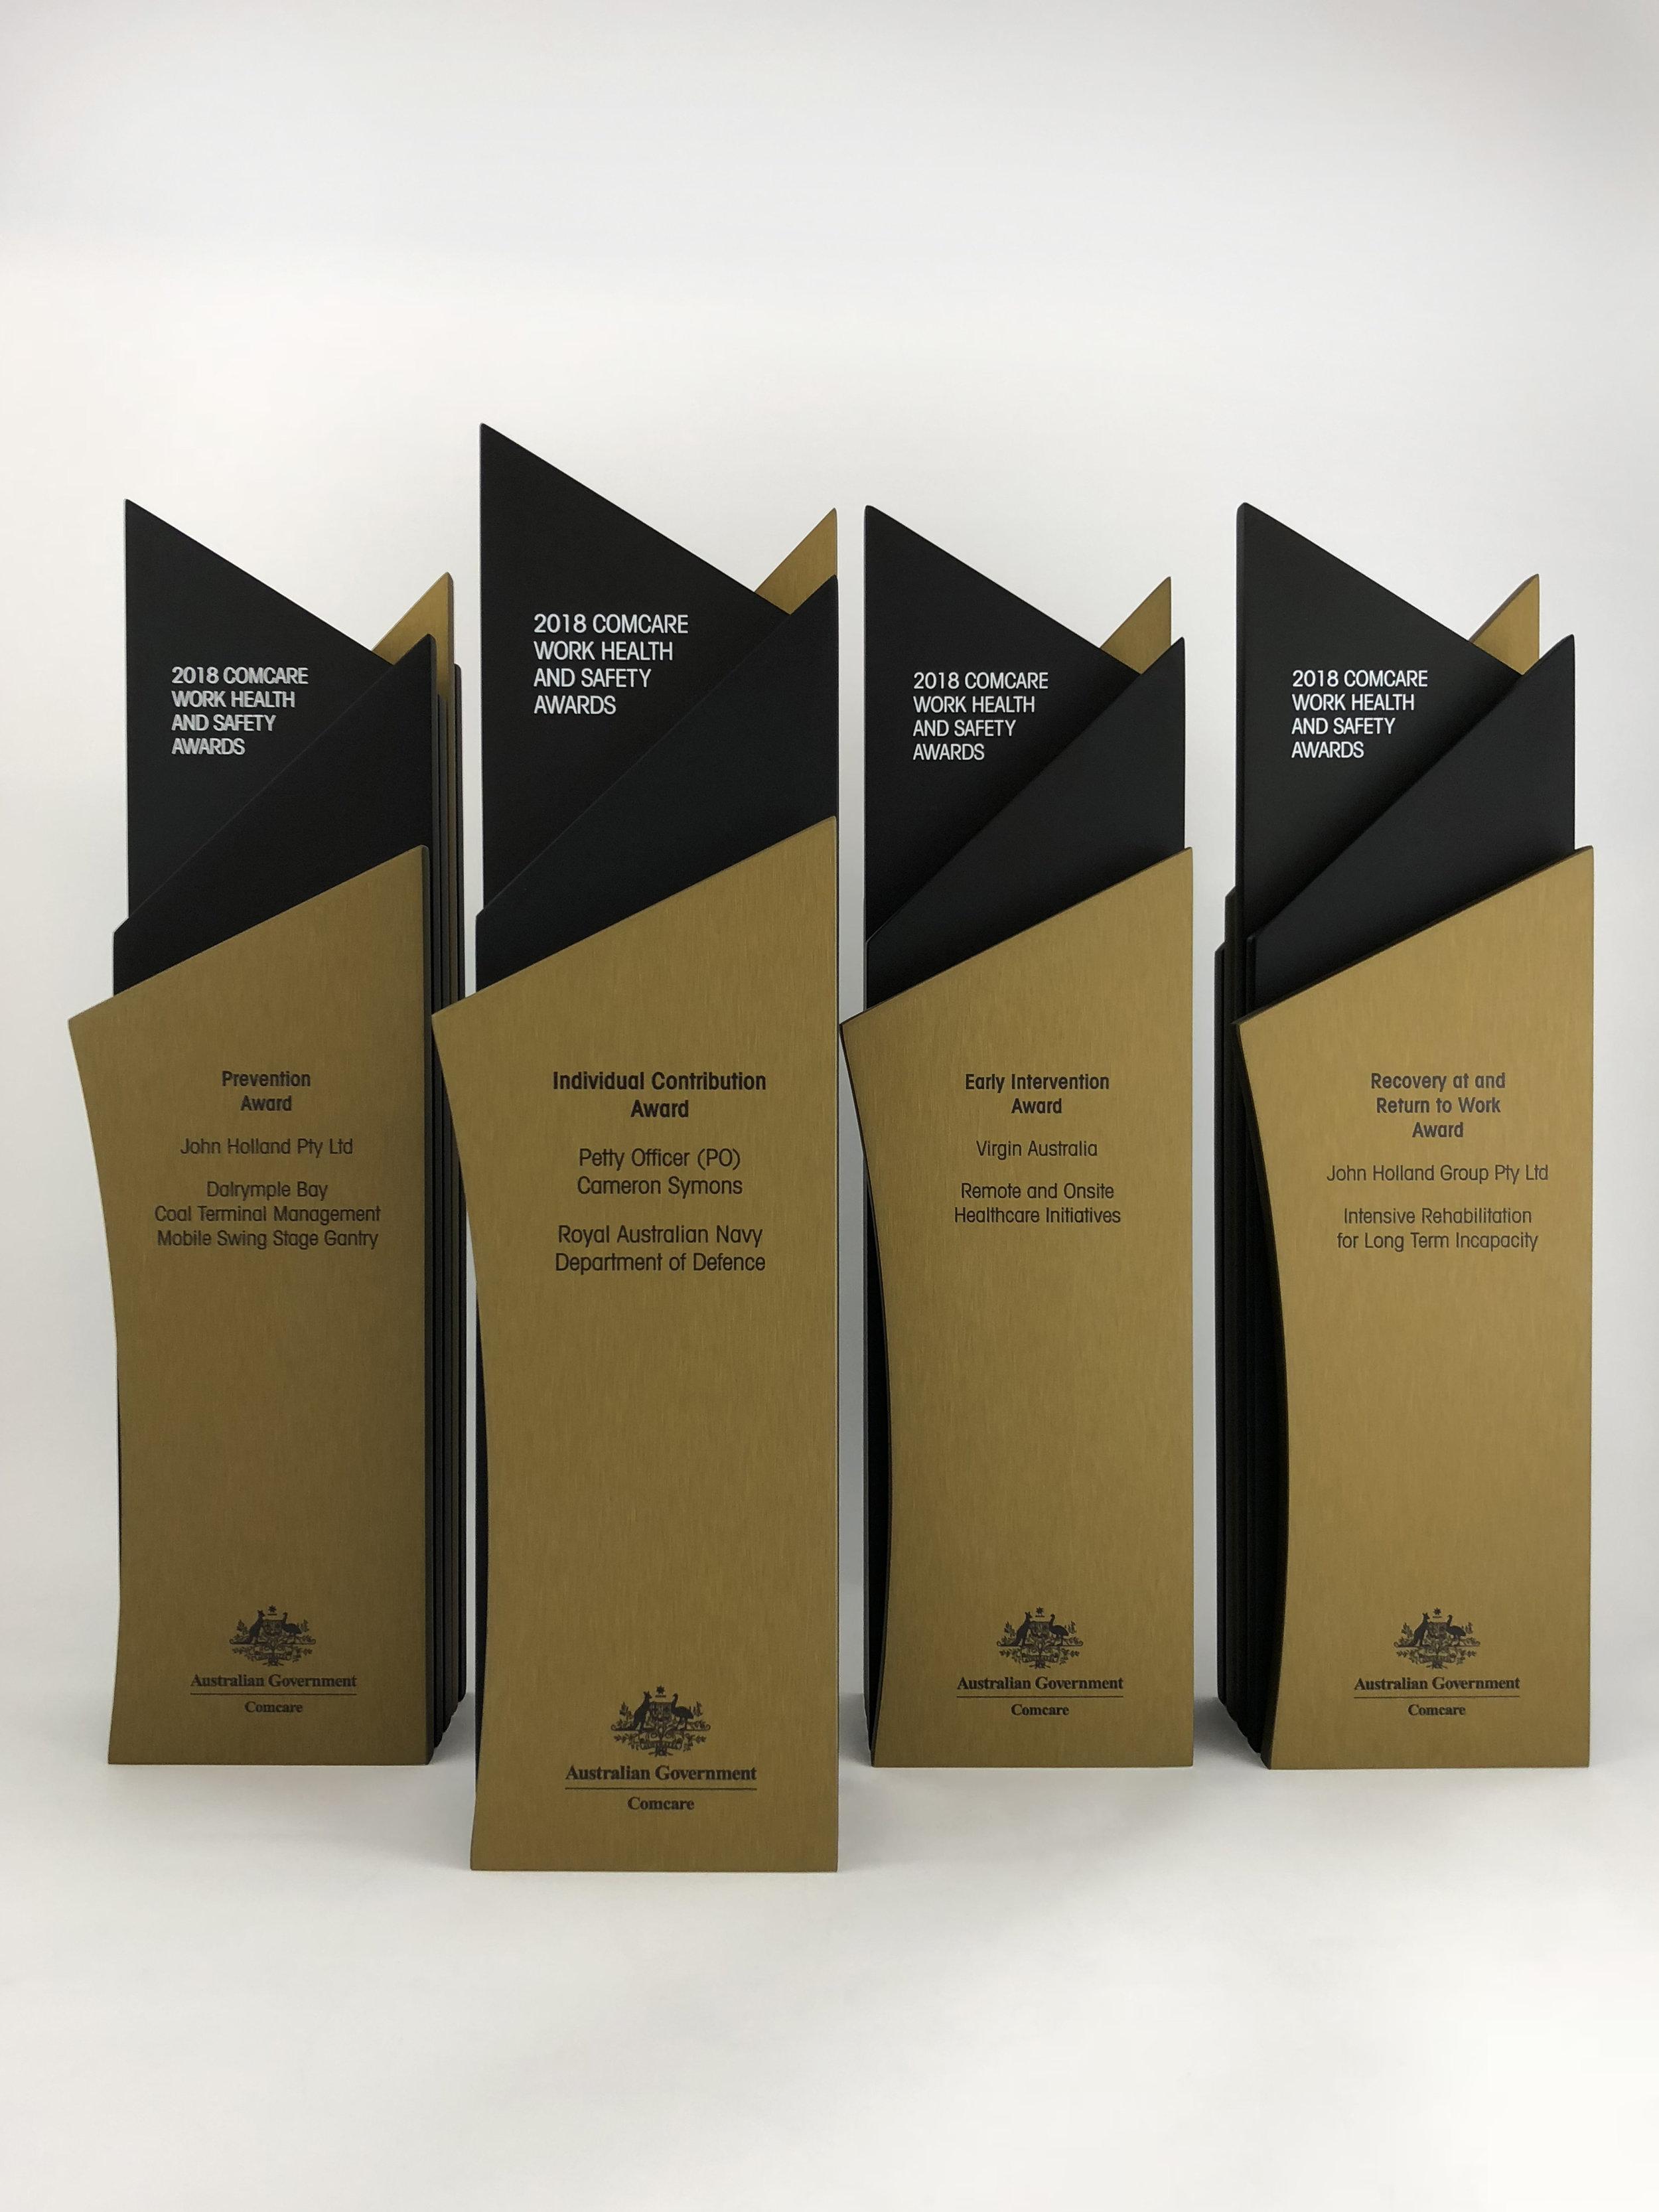 comcare-whs-awards-metal-trophy-03.jpg